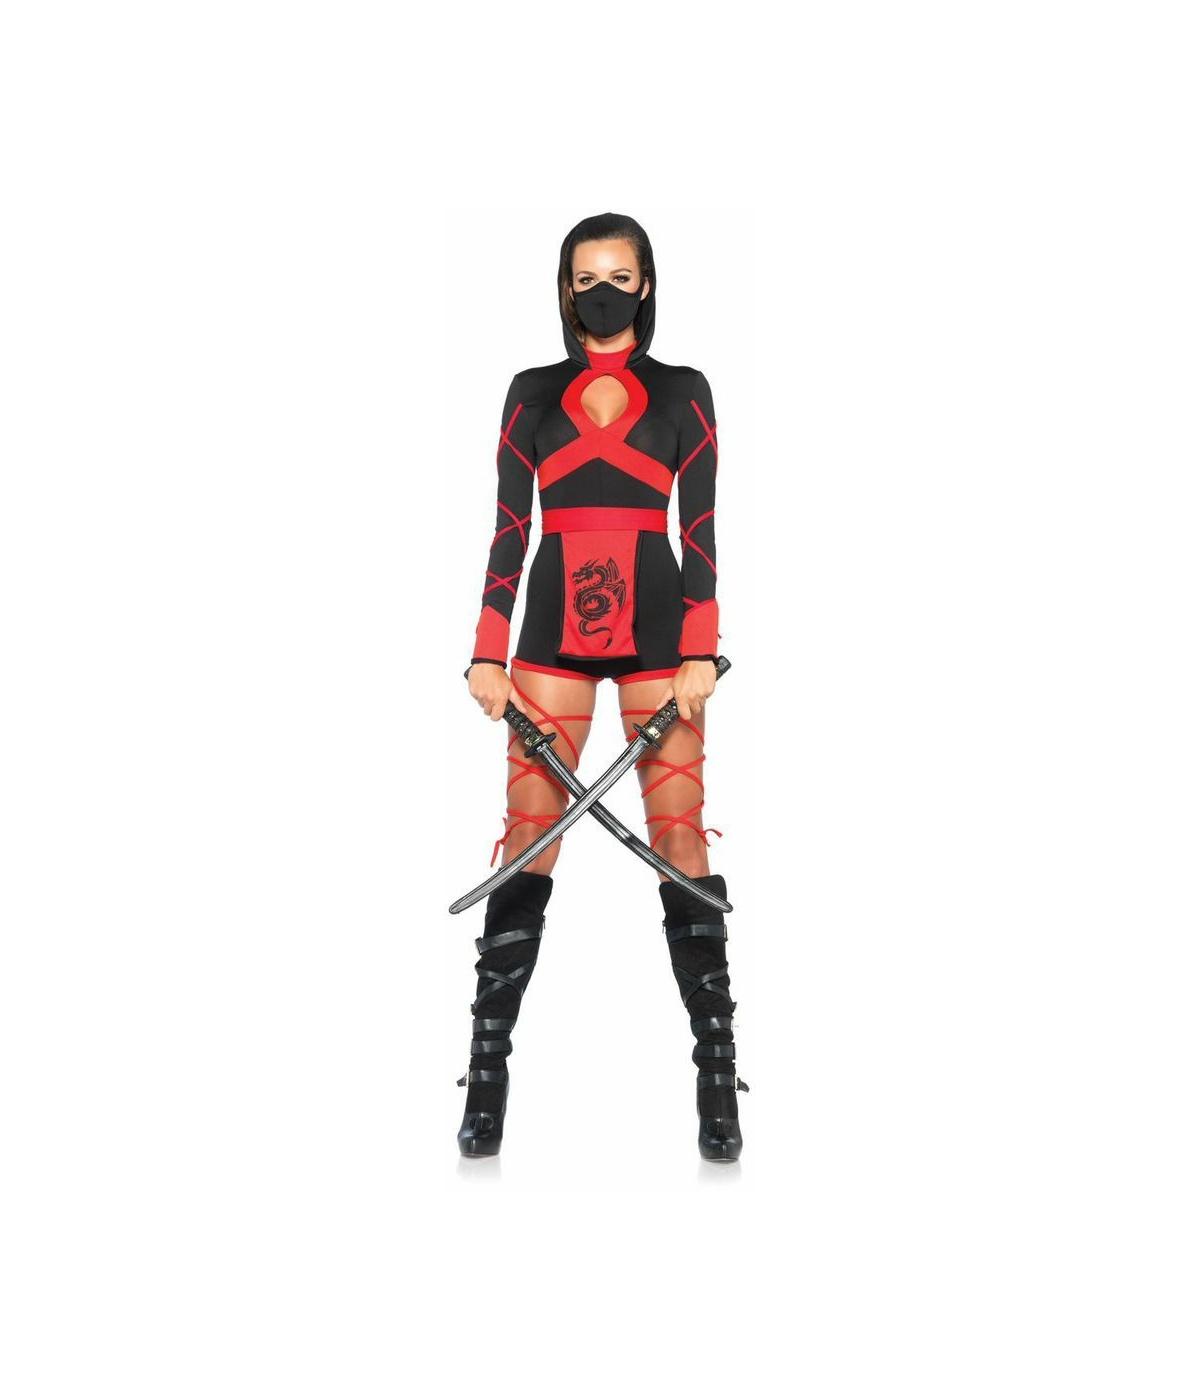 Girl Mascot Costume Wallpaper Fiery Dragon Womens Ninja Costume Sexy Costume